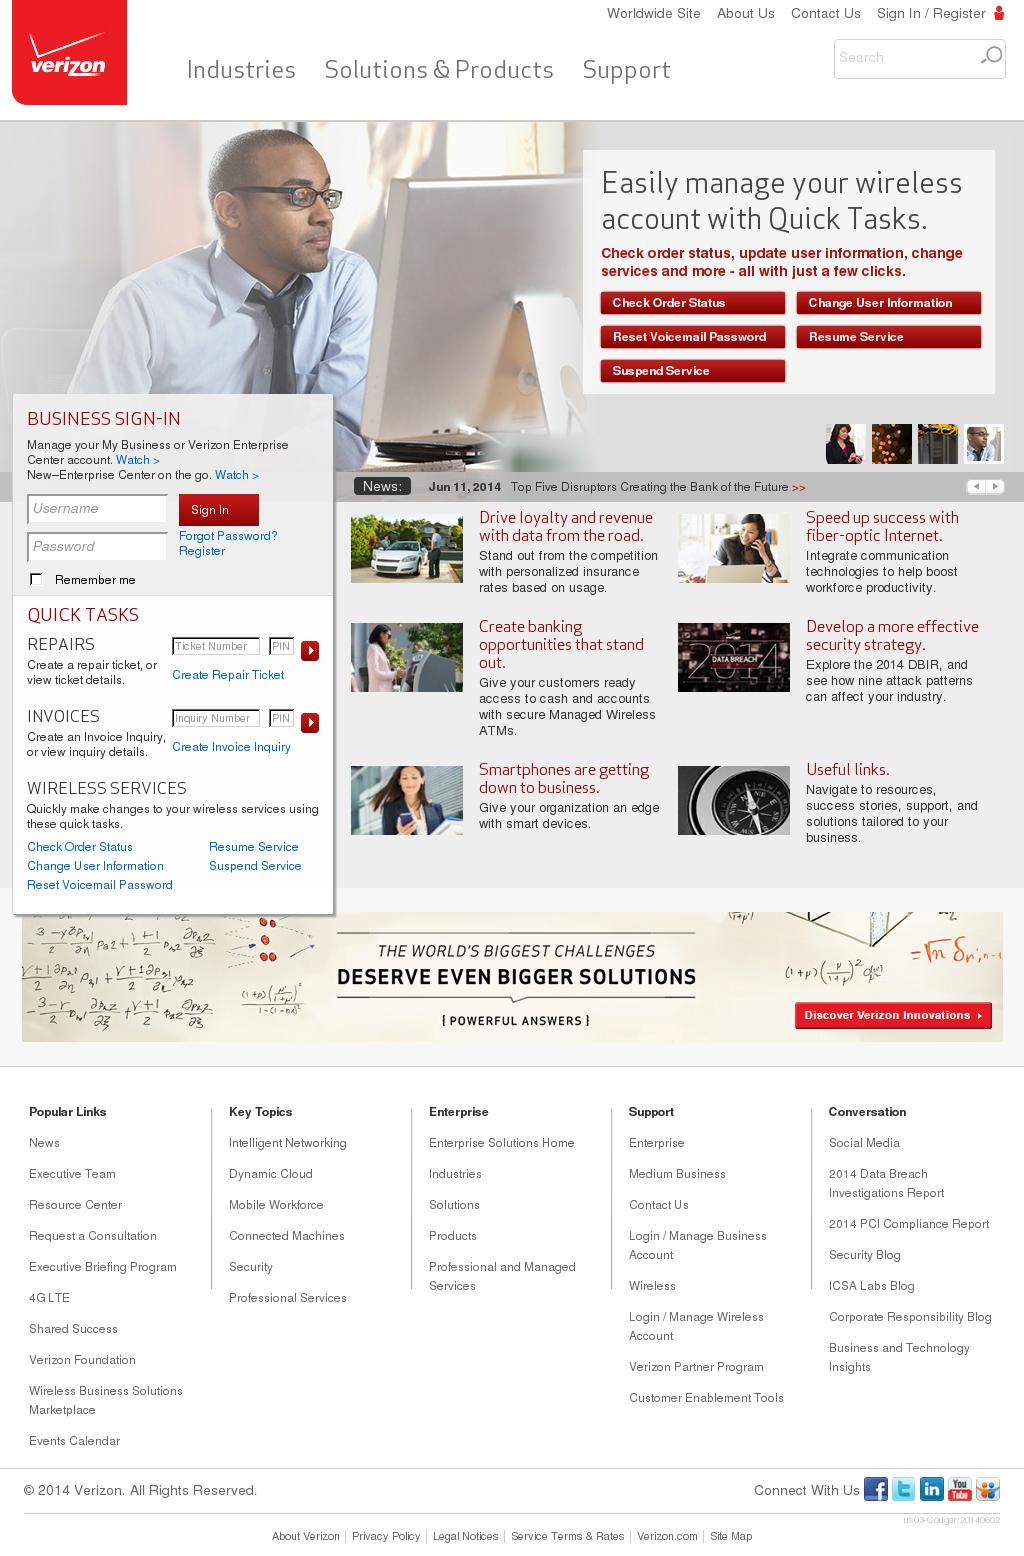 Verizon Enterprise Competitors, Revenue and Employees